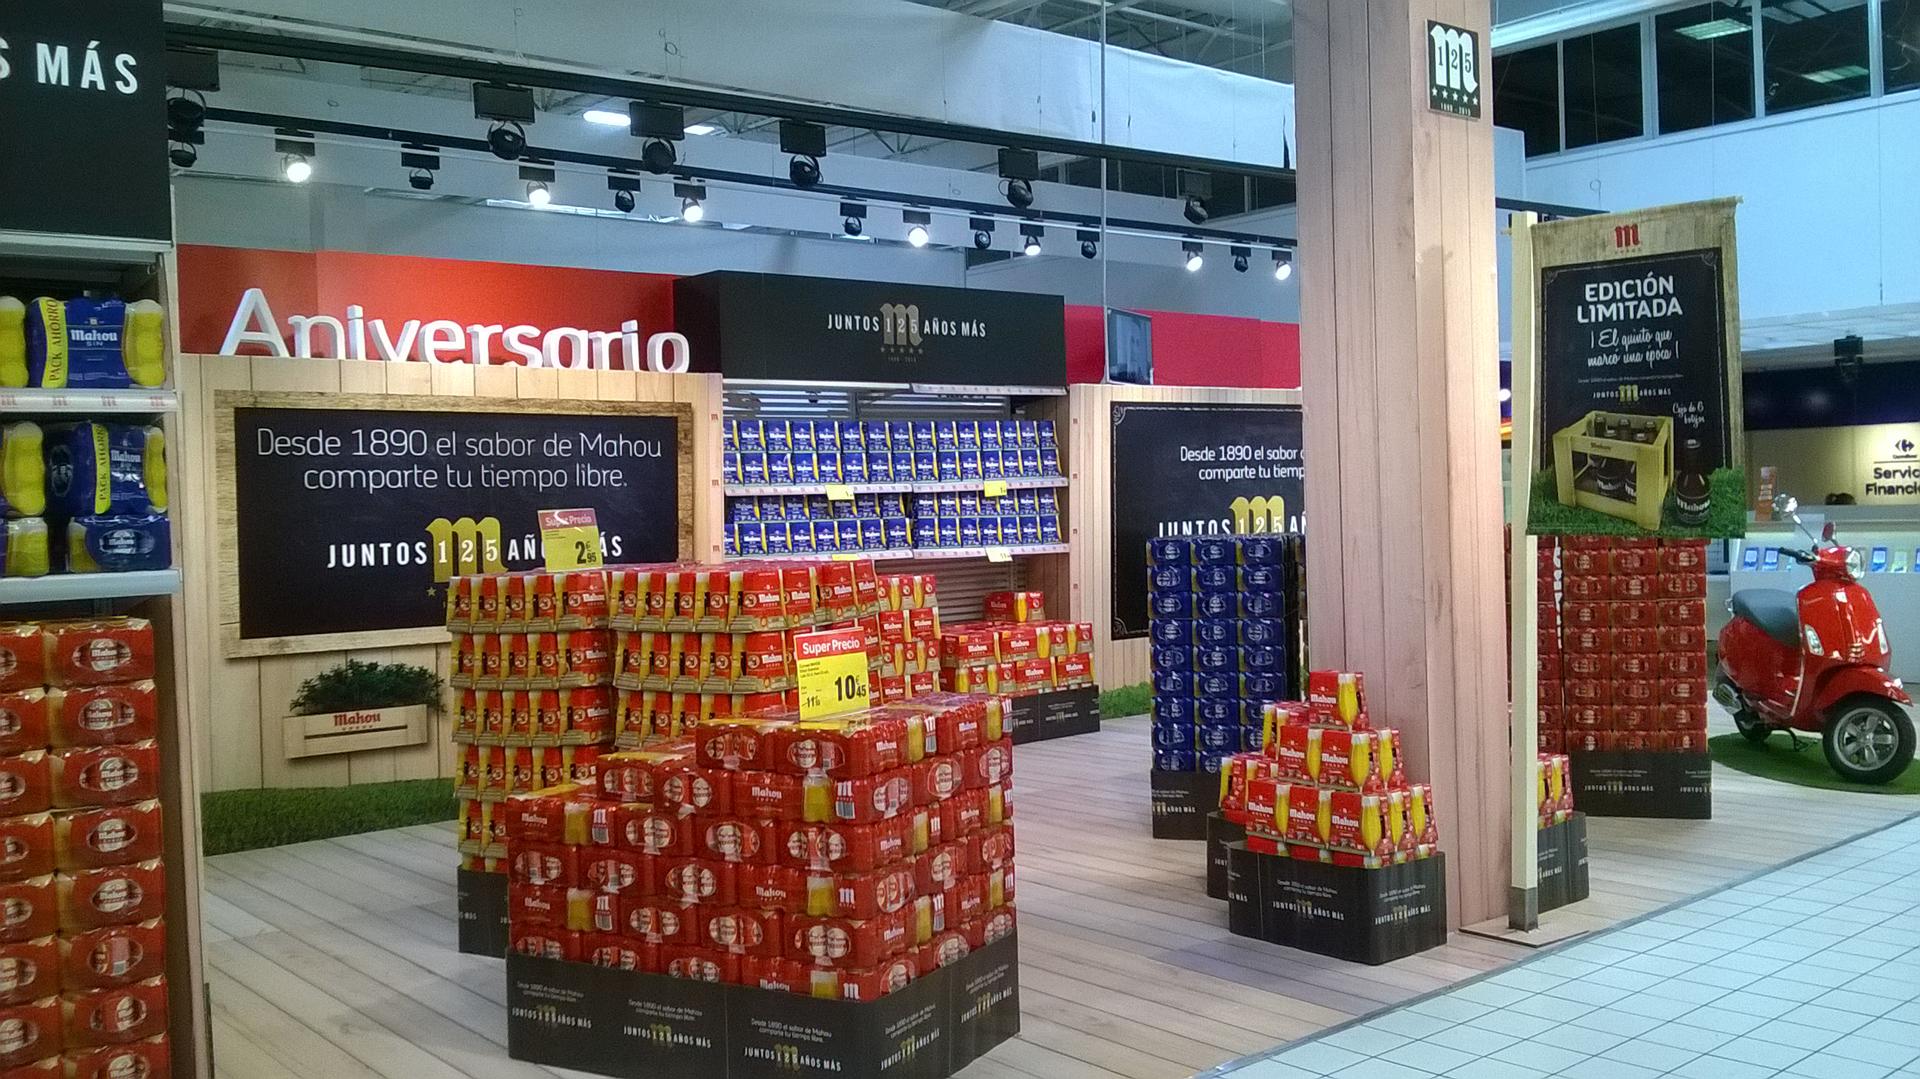 Mahou 125 aniversario supermercado Alcobendas